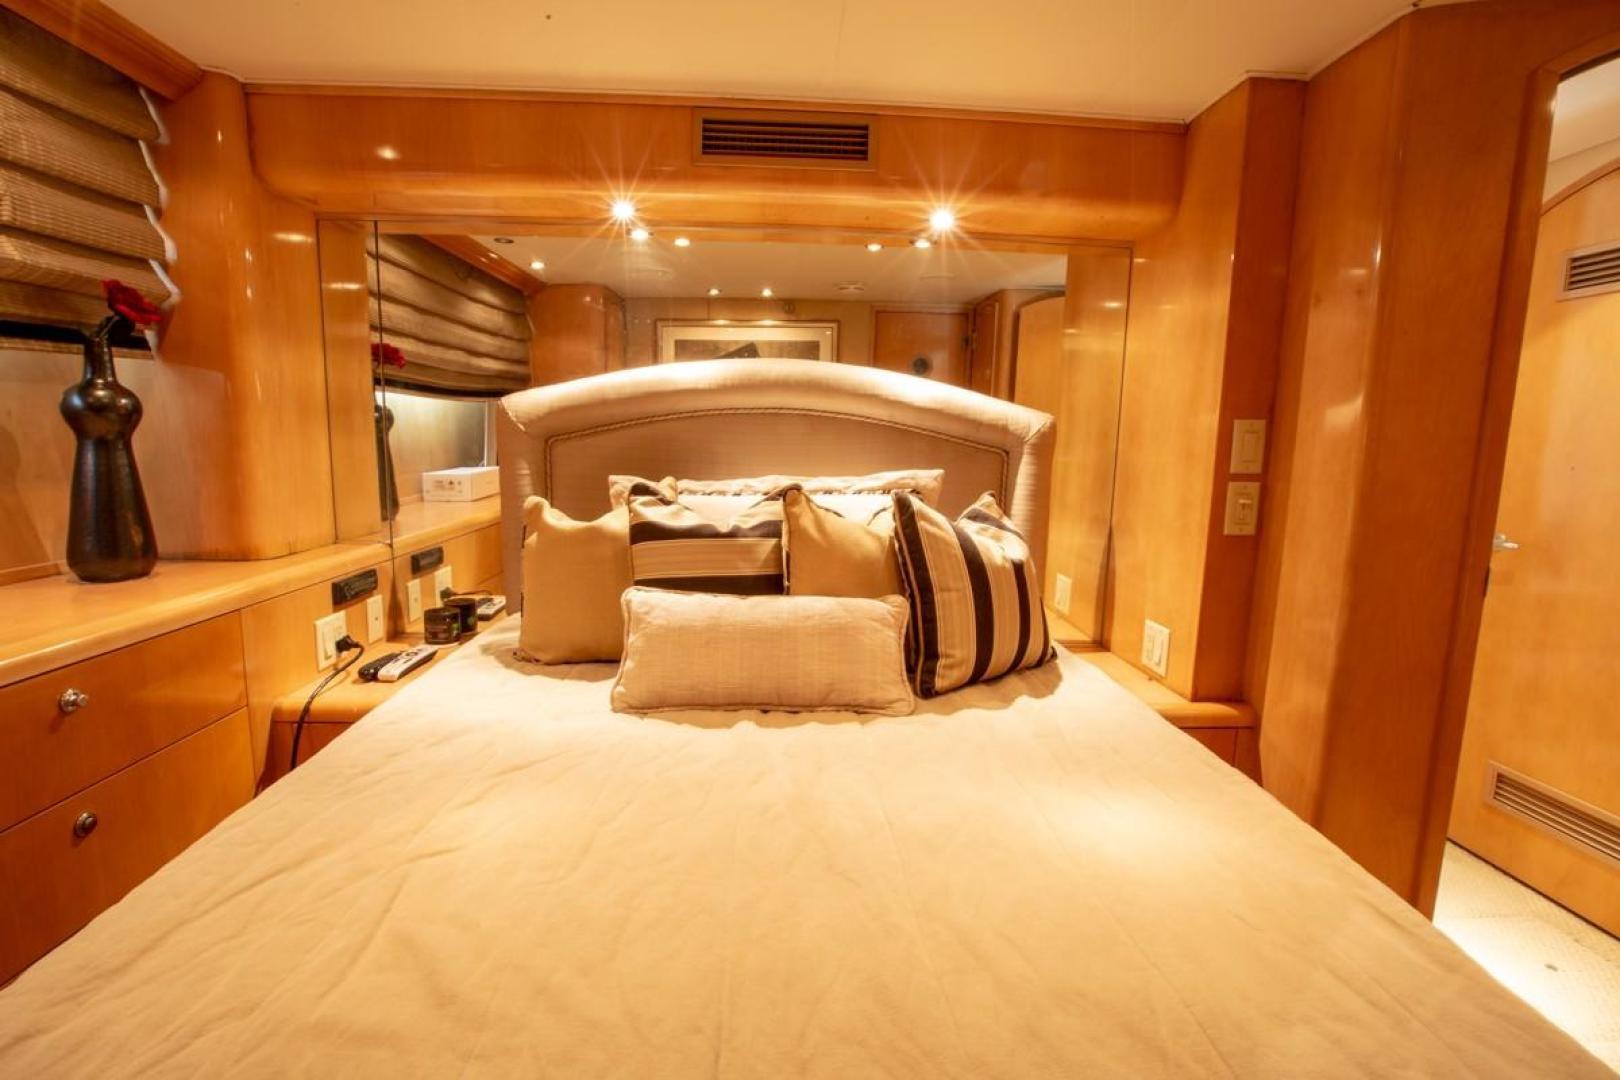 Hatteras-Cockpit Motor Yacht 2000-Getaway Ft. Lauderdale-Florida-United States-977378 | Thumbnail